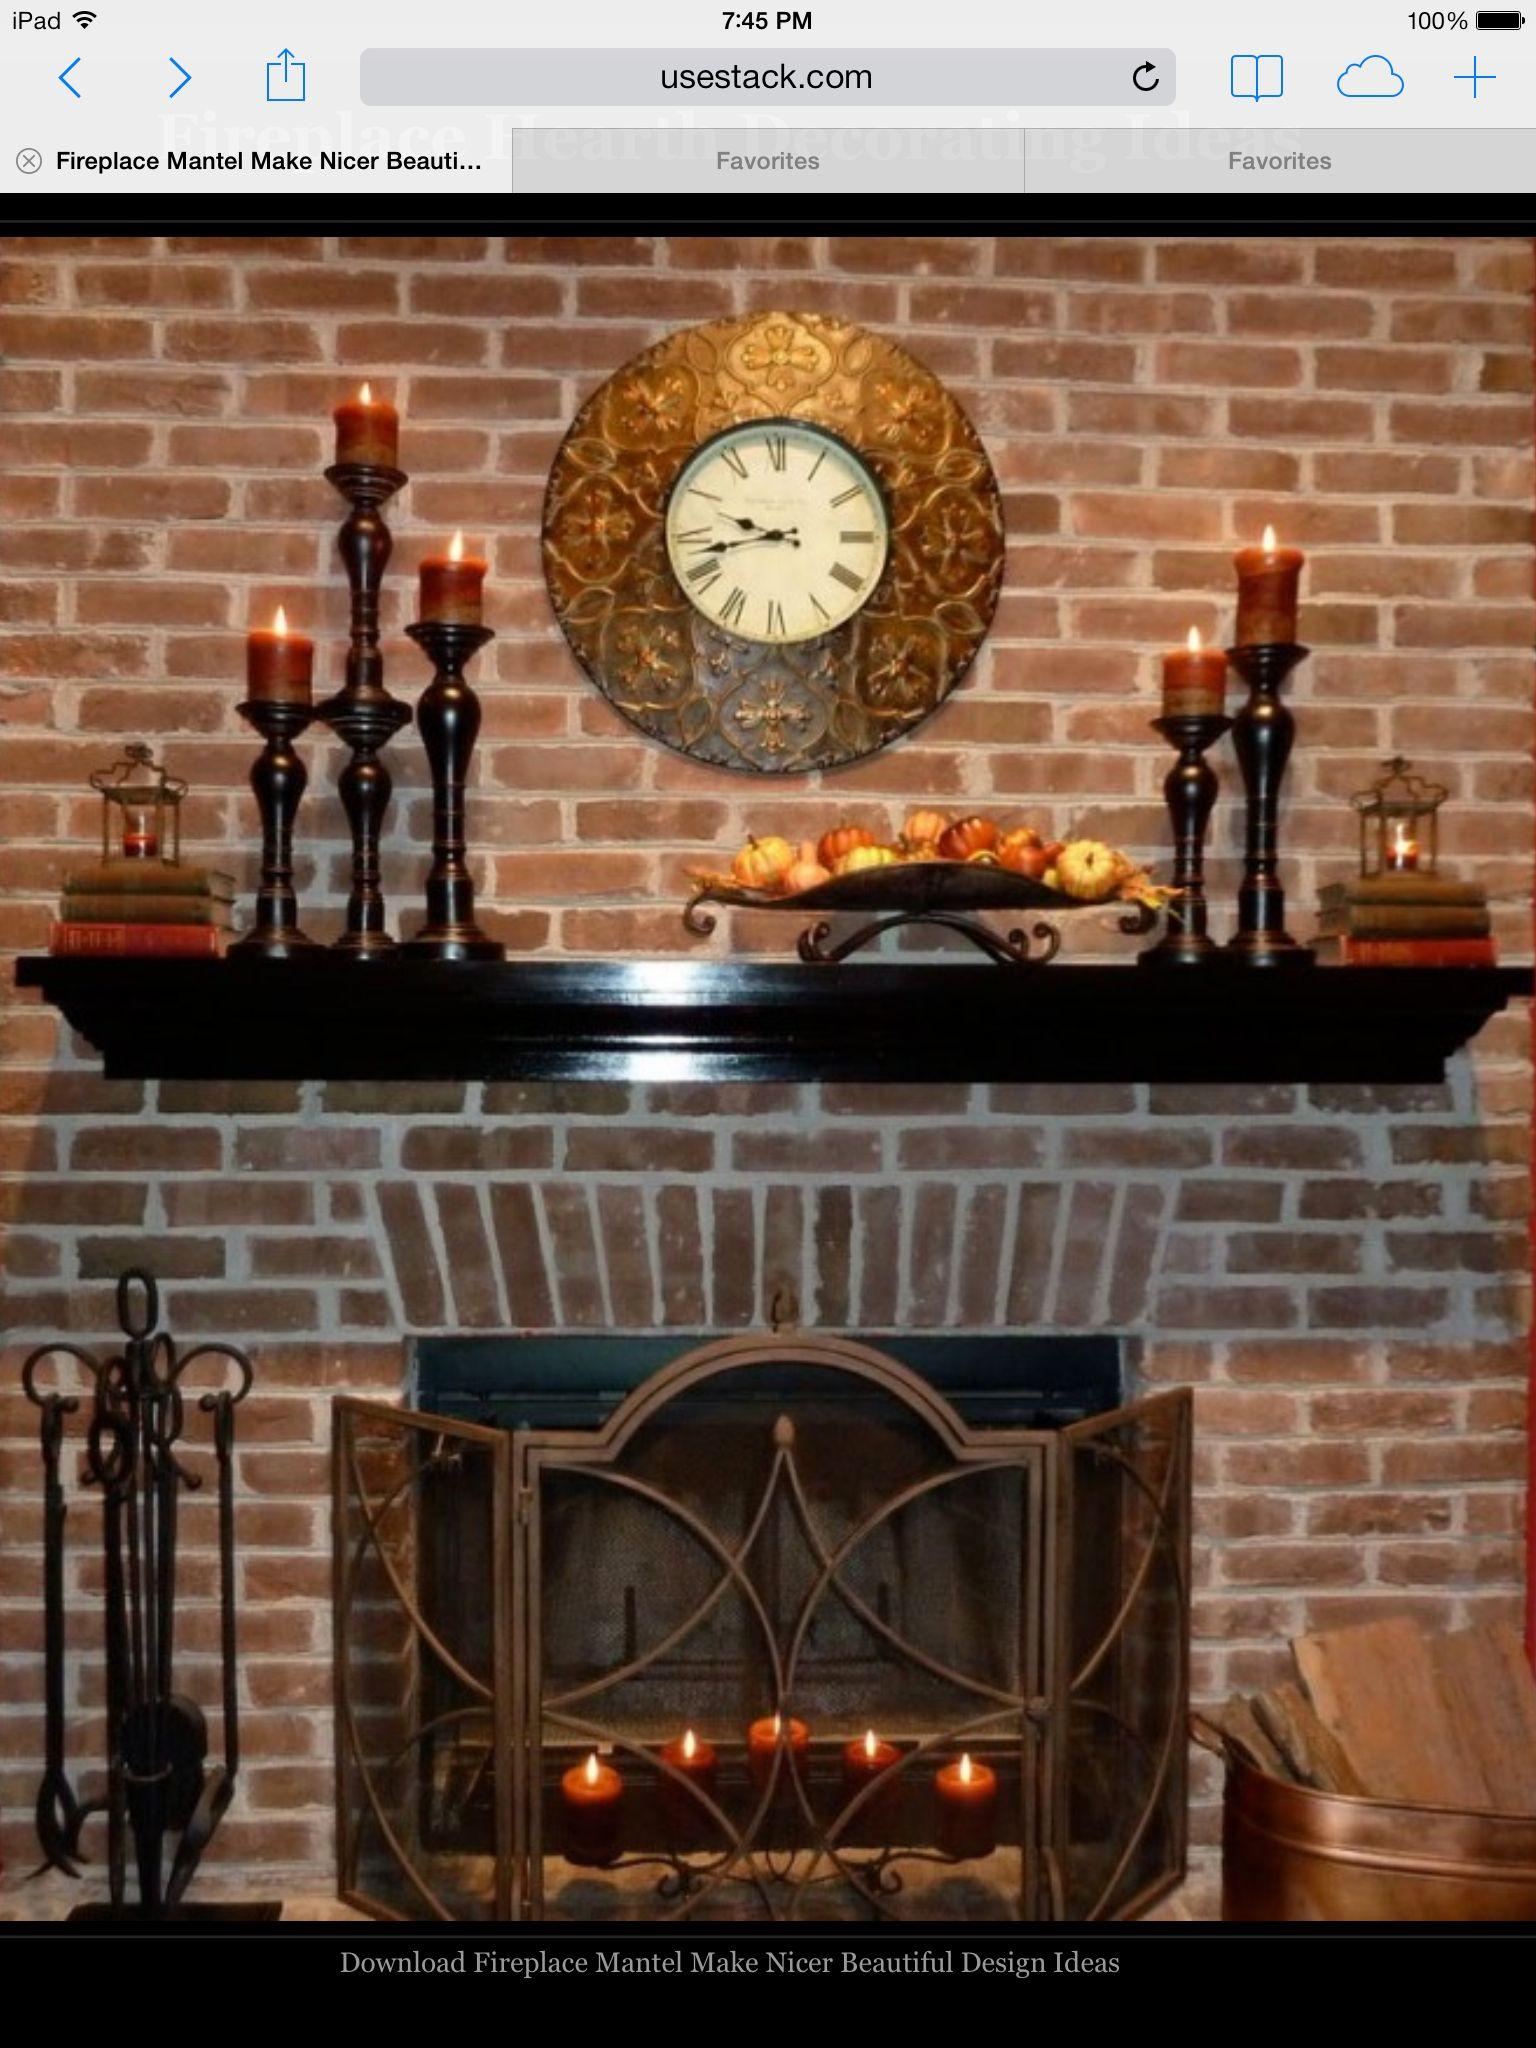 fireplace mantel mantel and fireplace pinterest mantels and